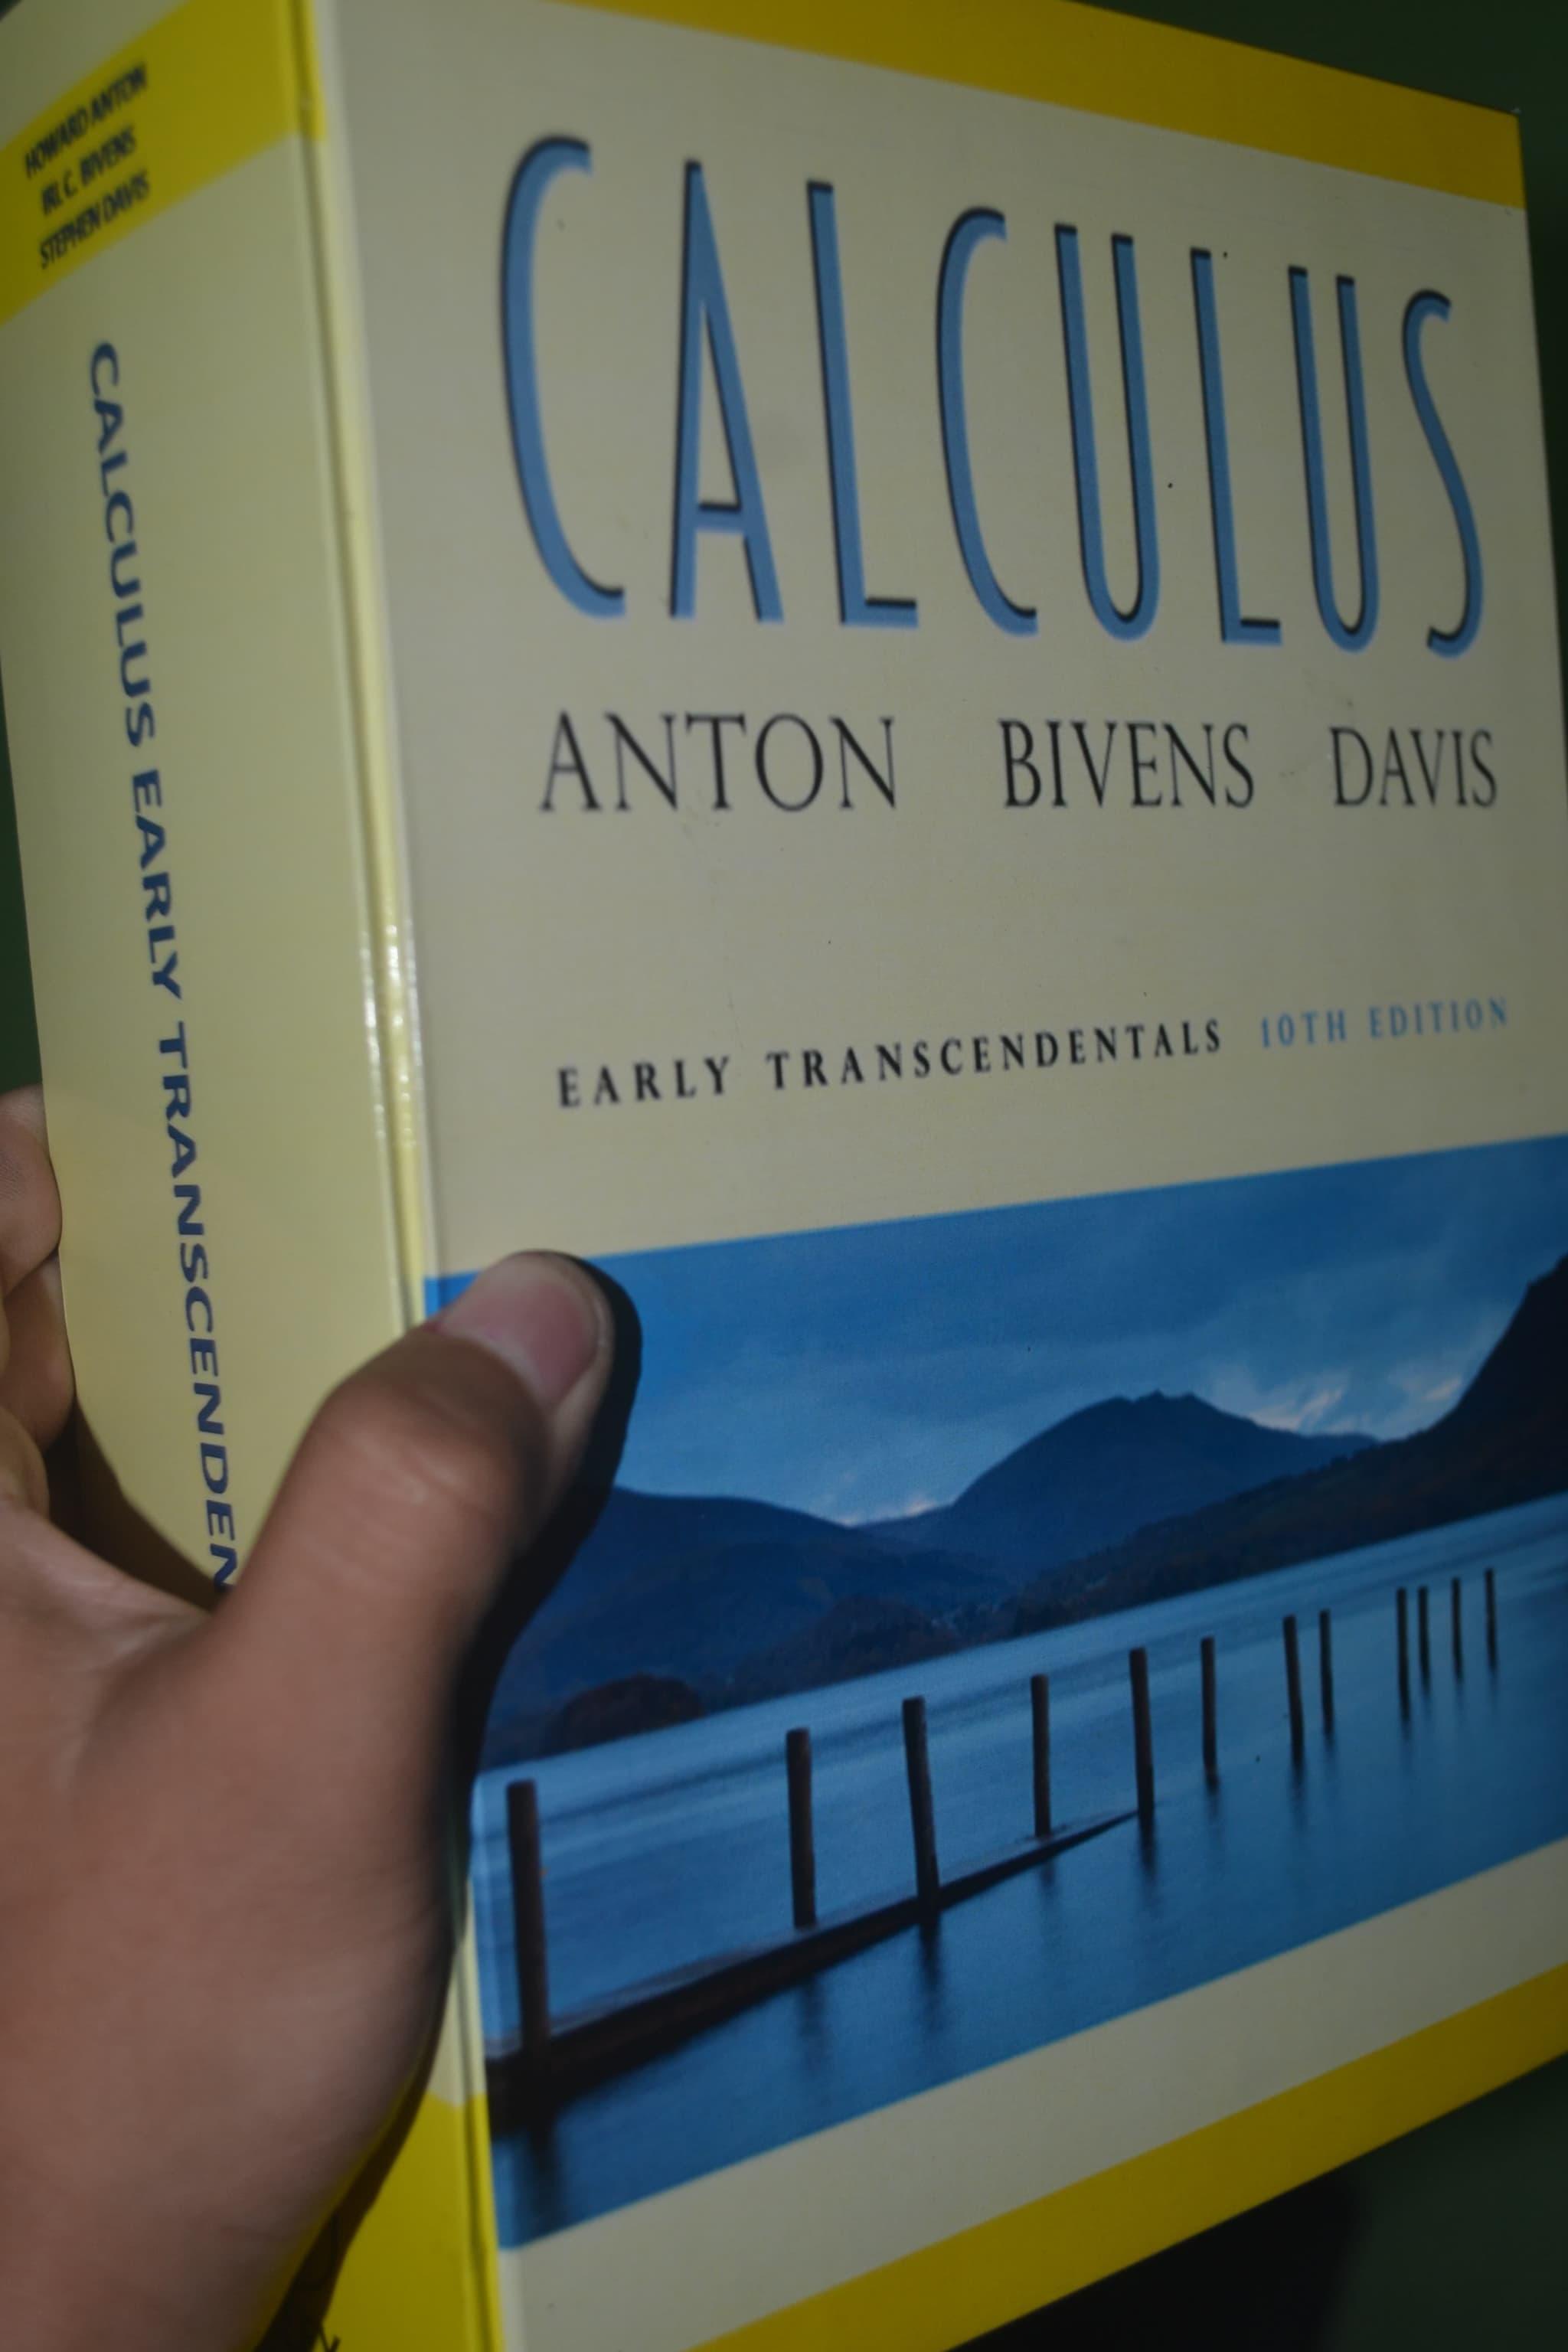 Jual Buku Teknik Calculus Early Transcendentals 10th & Solution Manual -  AAA GRAFIKA | Tokopedia